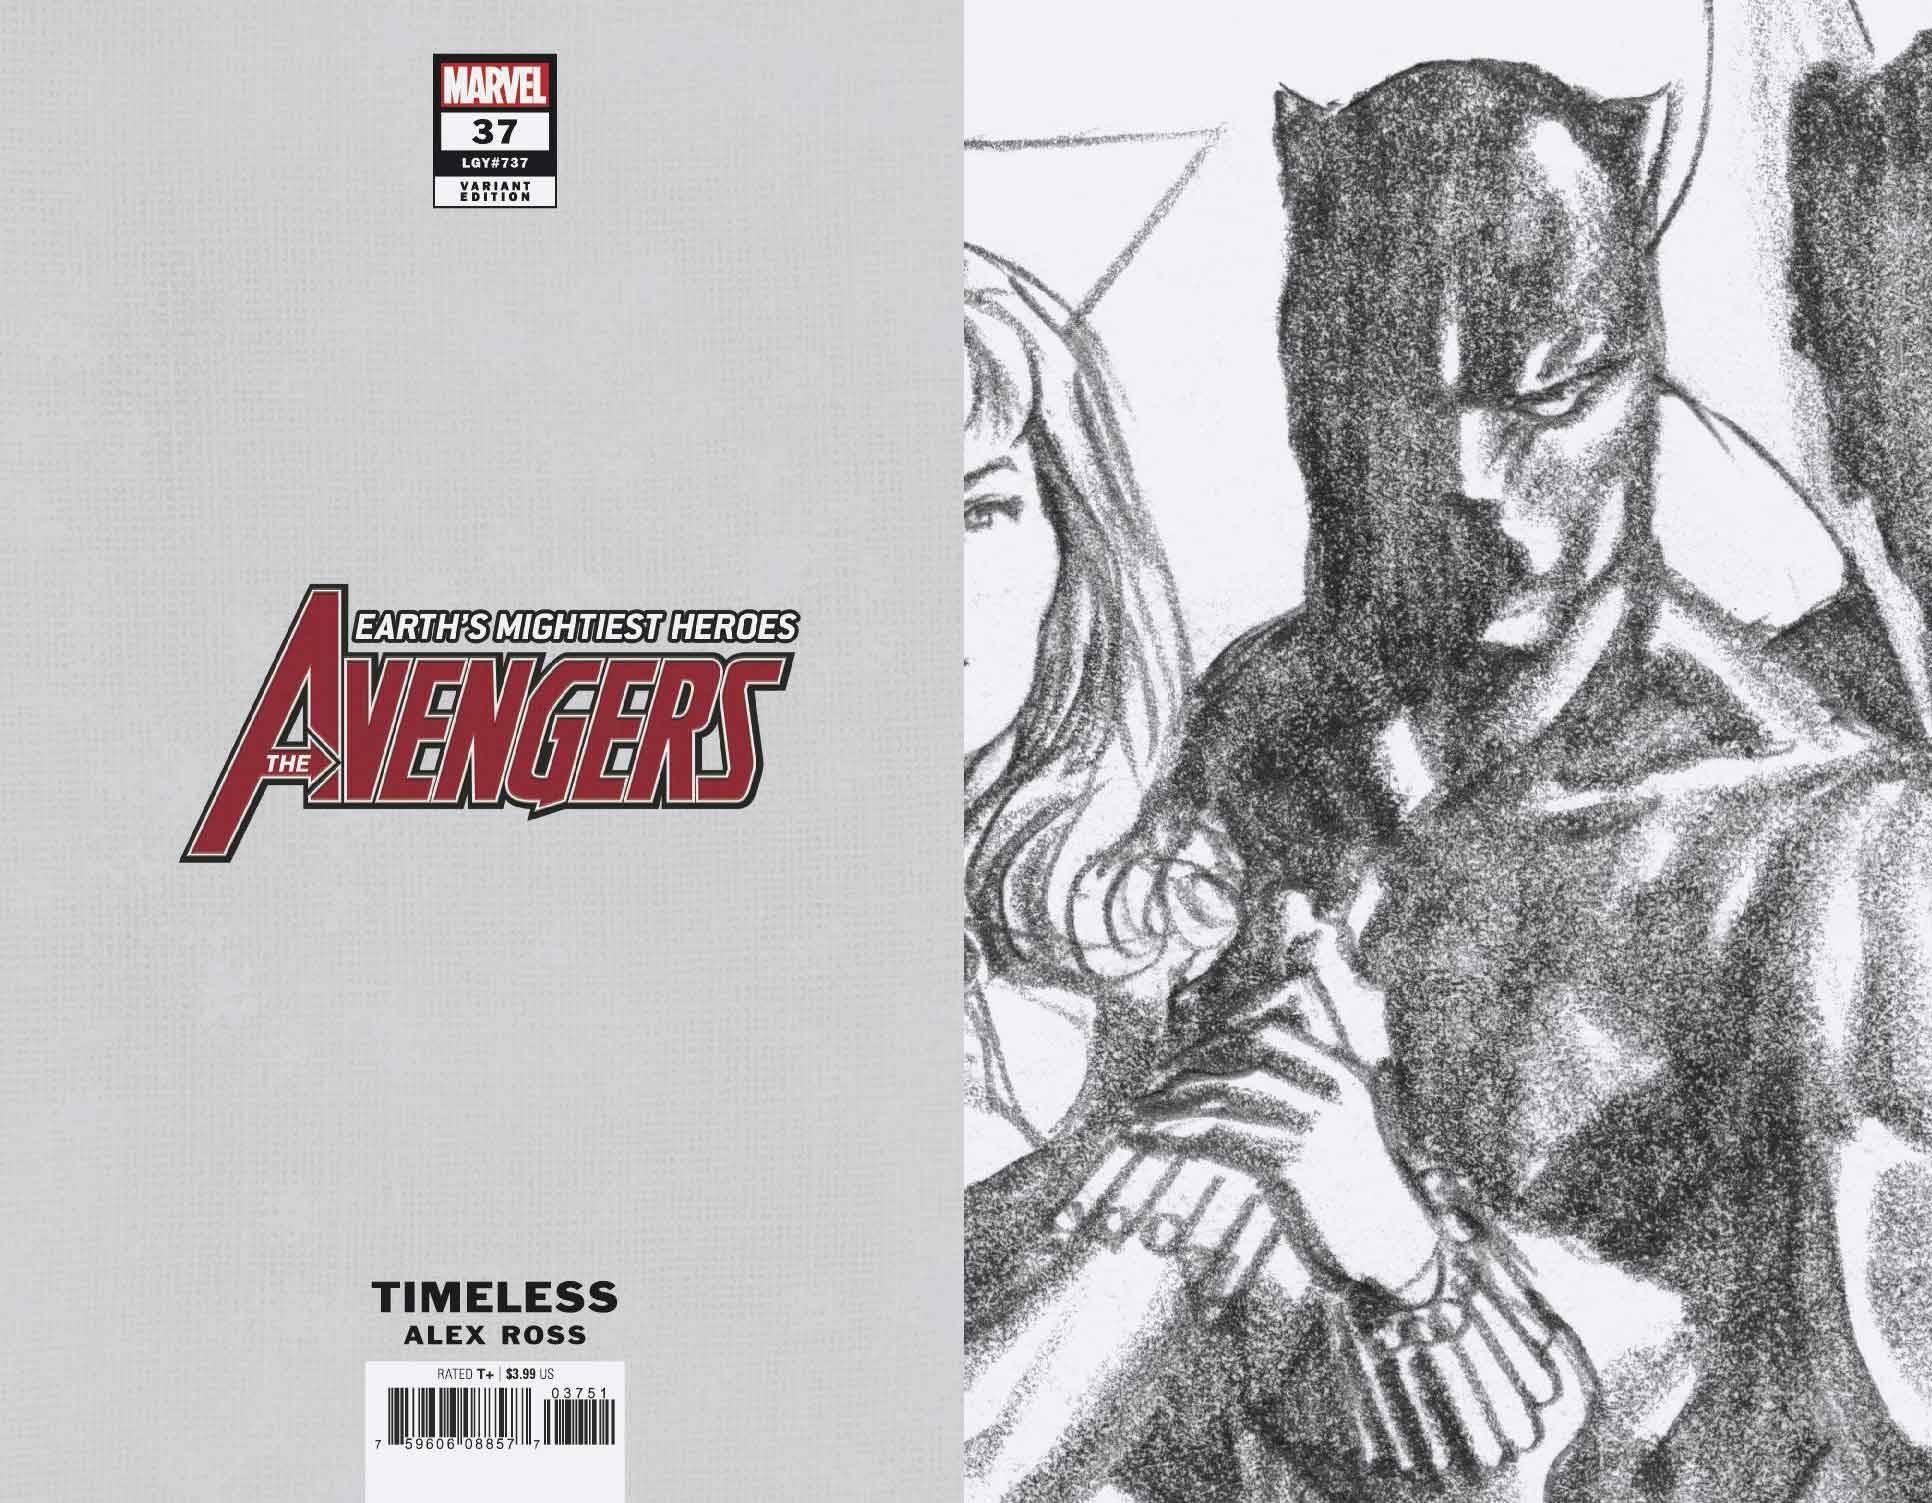 Avengers Vol 8 37 Black Panther Timeless Sketch Wraparound Variant.jpg